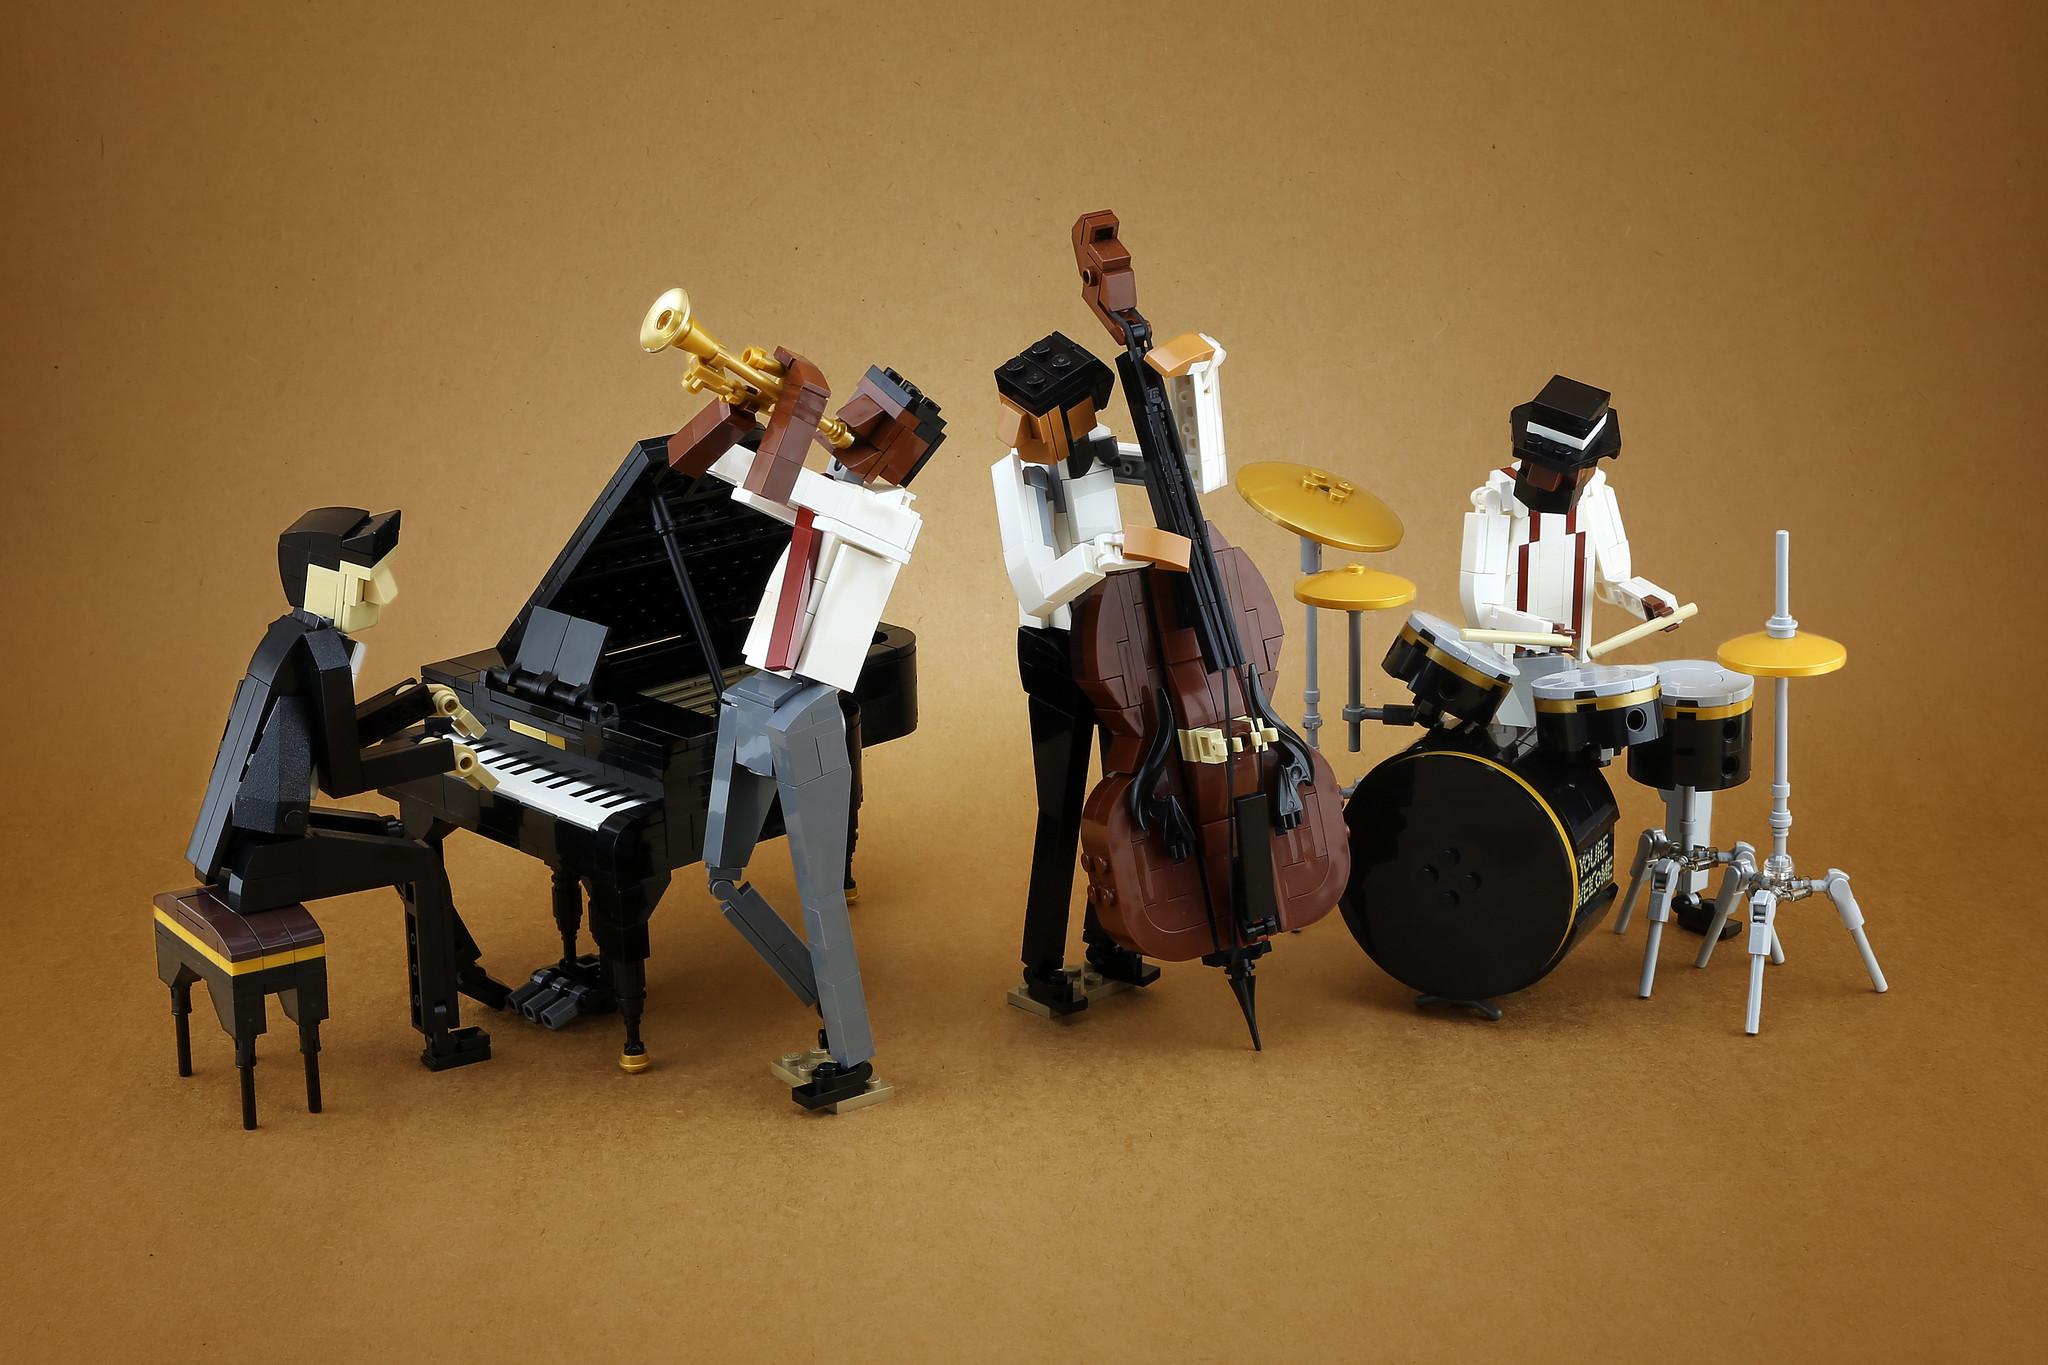 jazz-quartett-lego-7 zusammengebaut.com